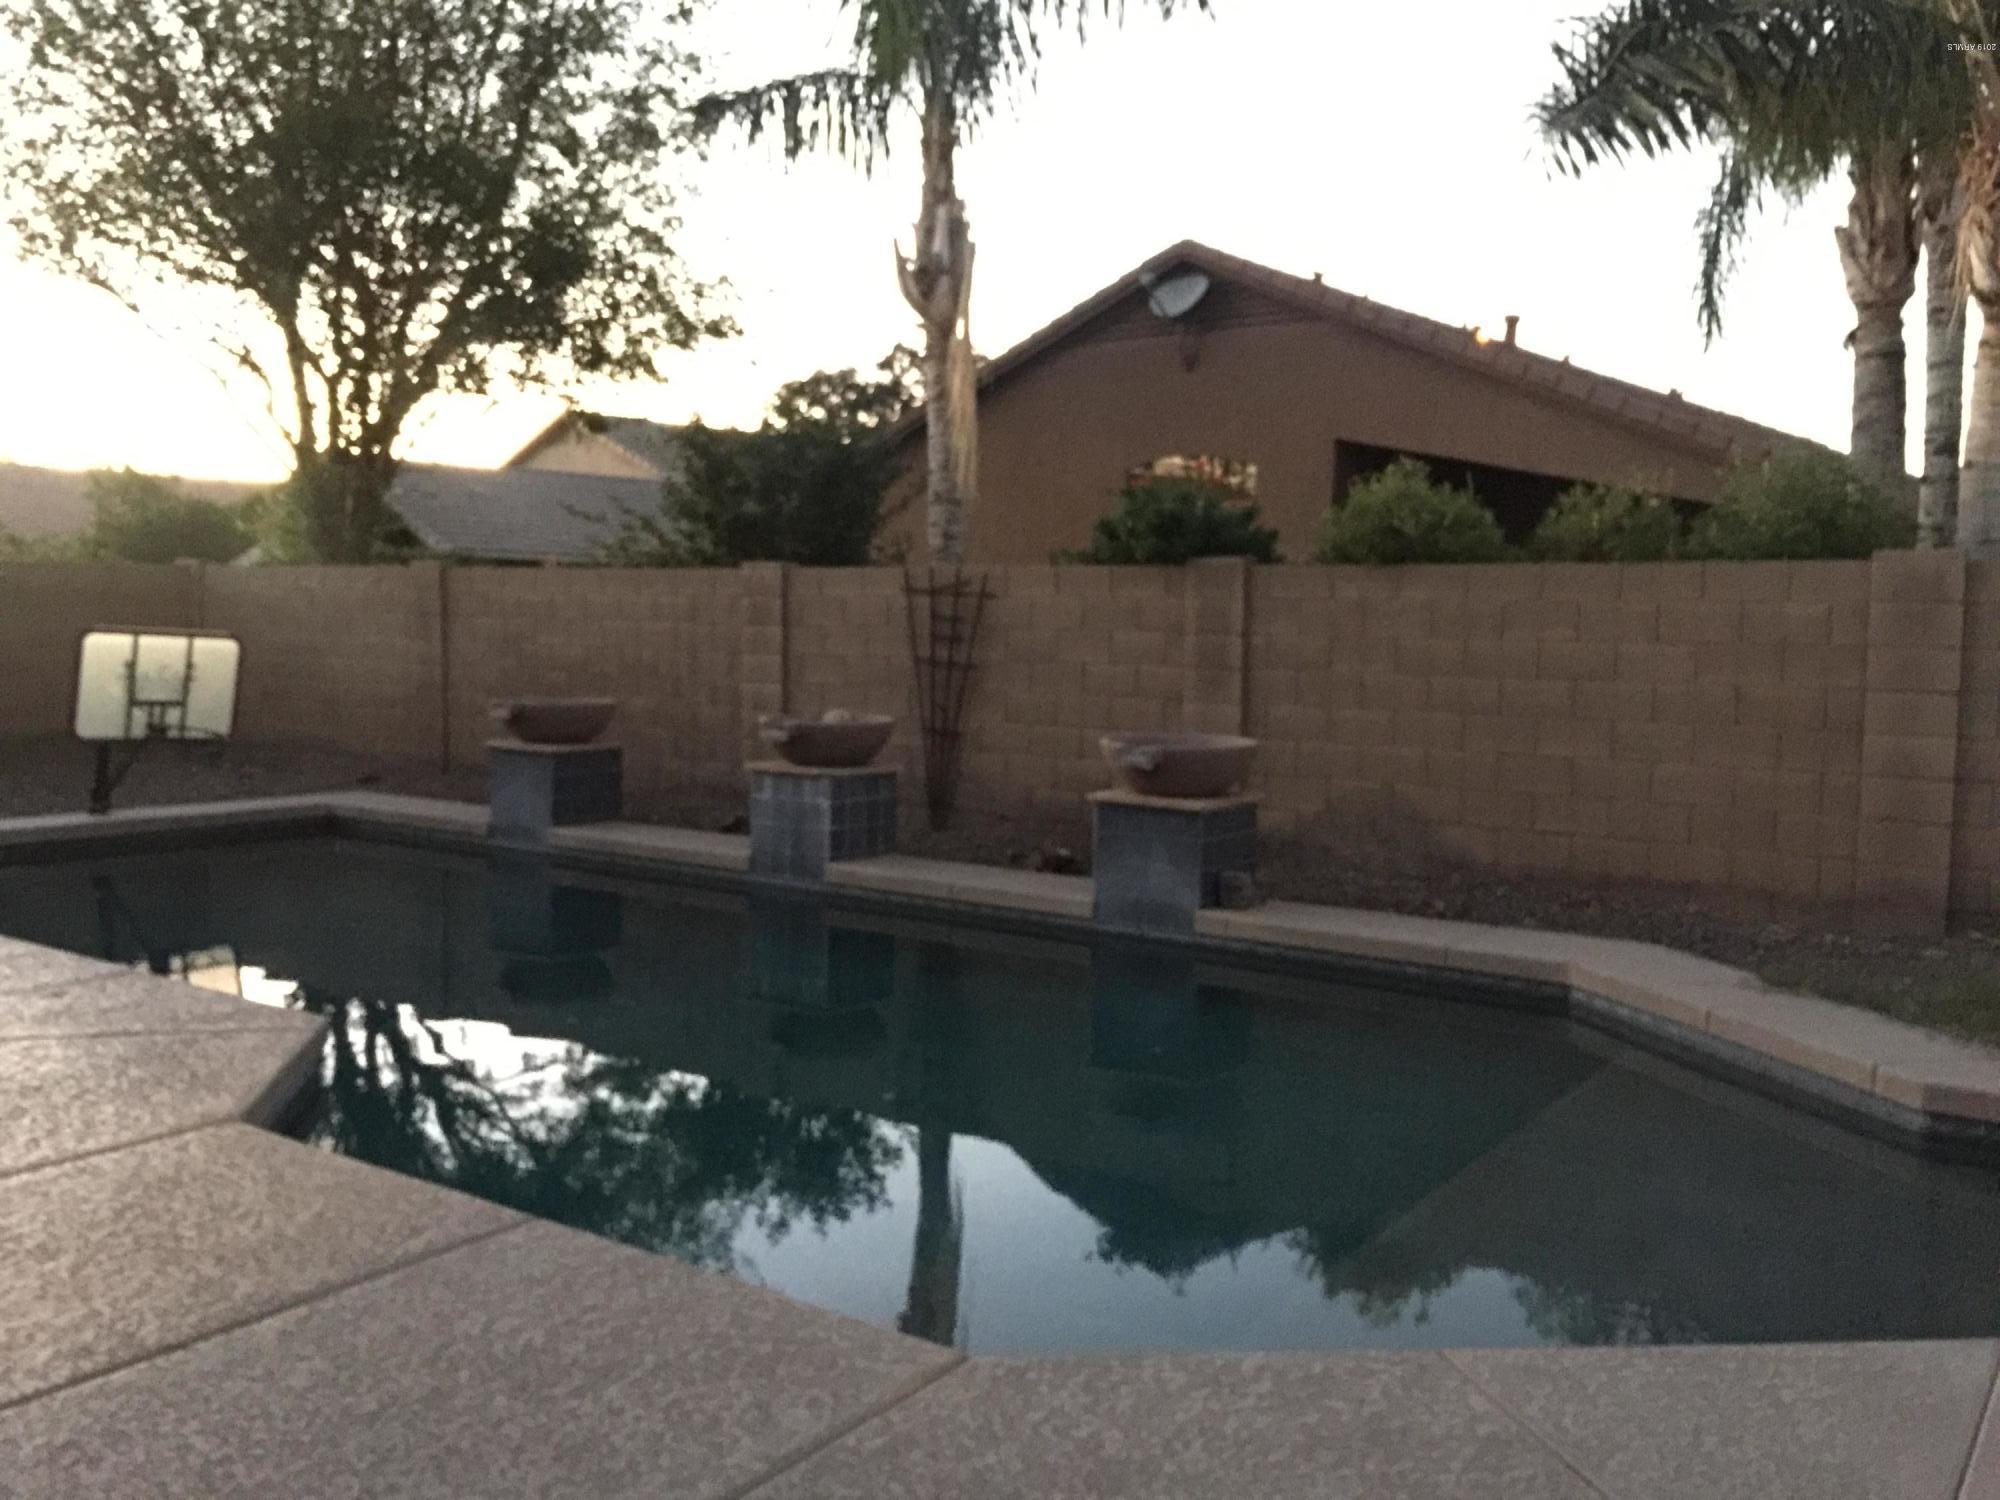 MLS 5875590 2400 E WHITTEN Street, Chandler, AZ 85225 Chandler AZ Kempton Crossing